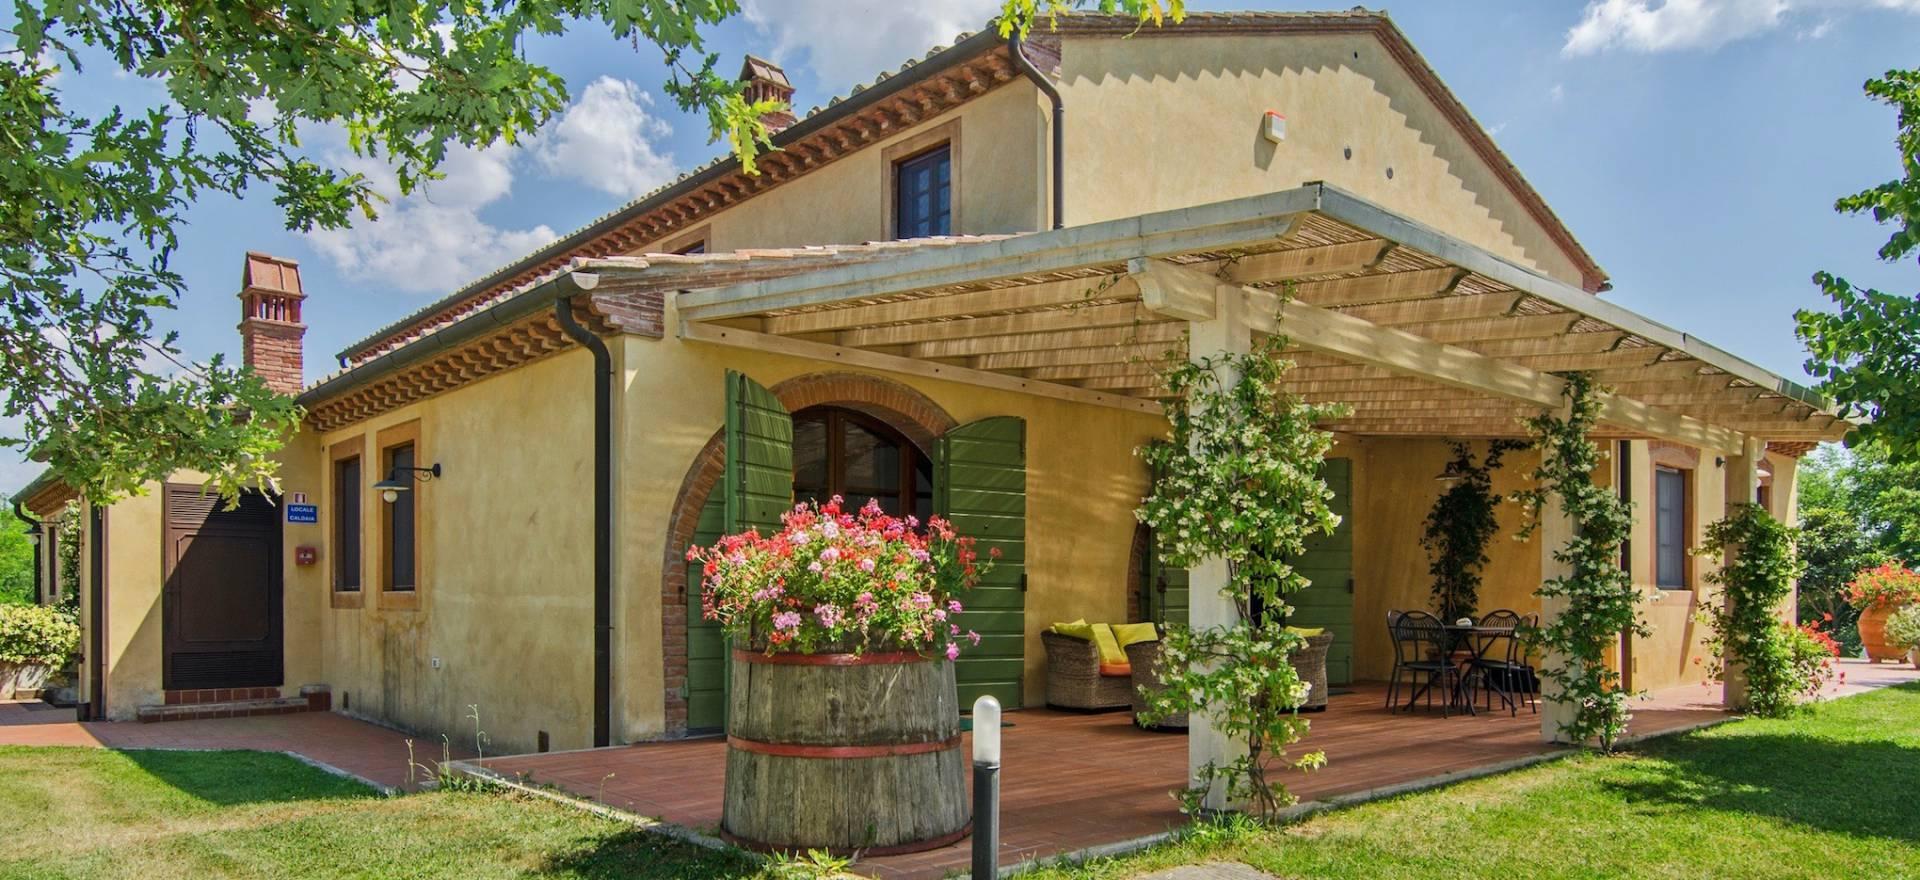 Agriturismo Toscane Agriturismo met panoramisch zwembad in Toscane